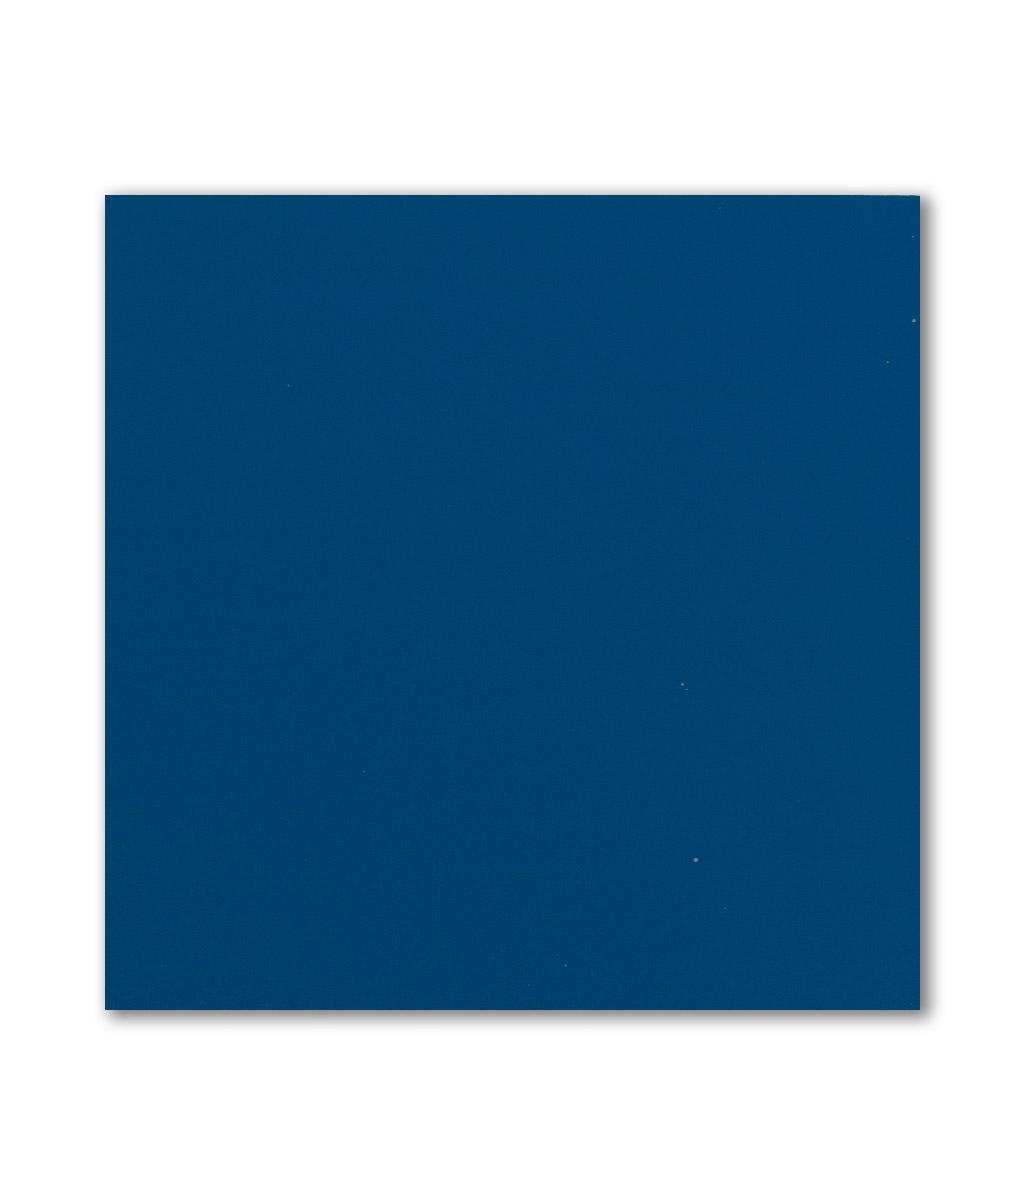 816 Peacock Blue